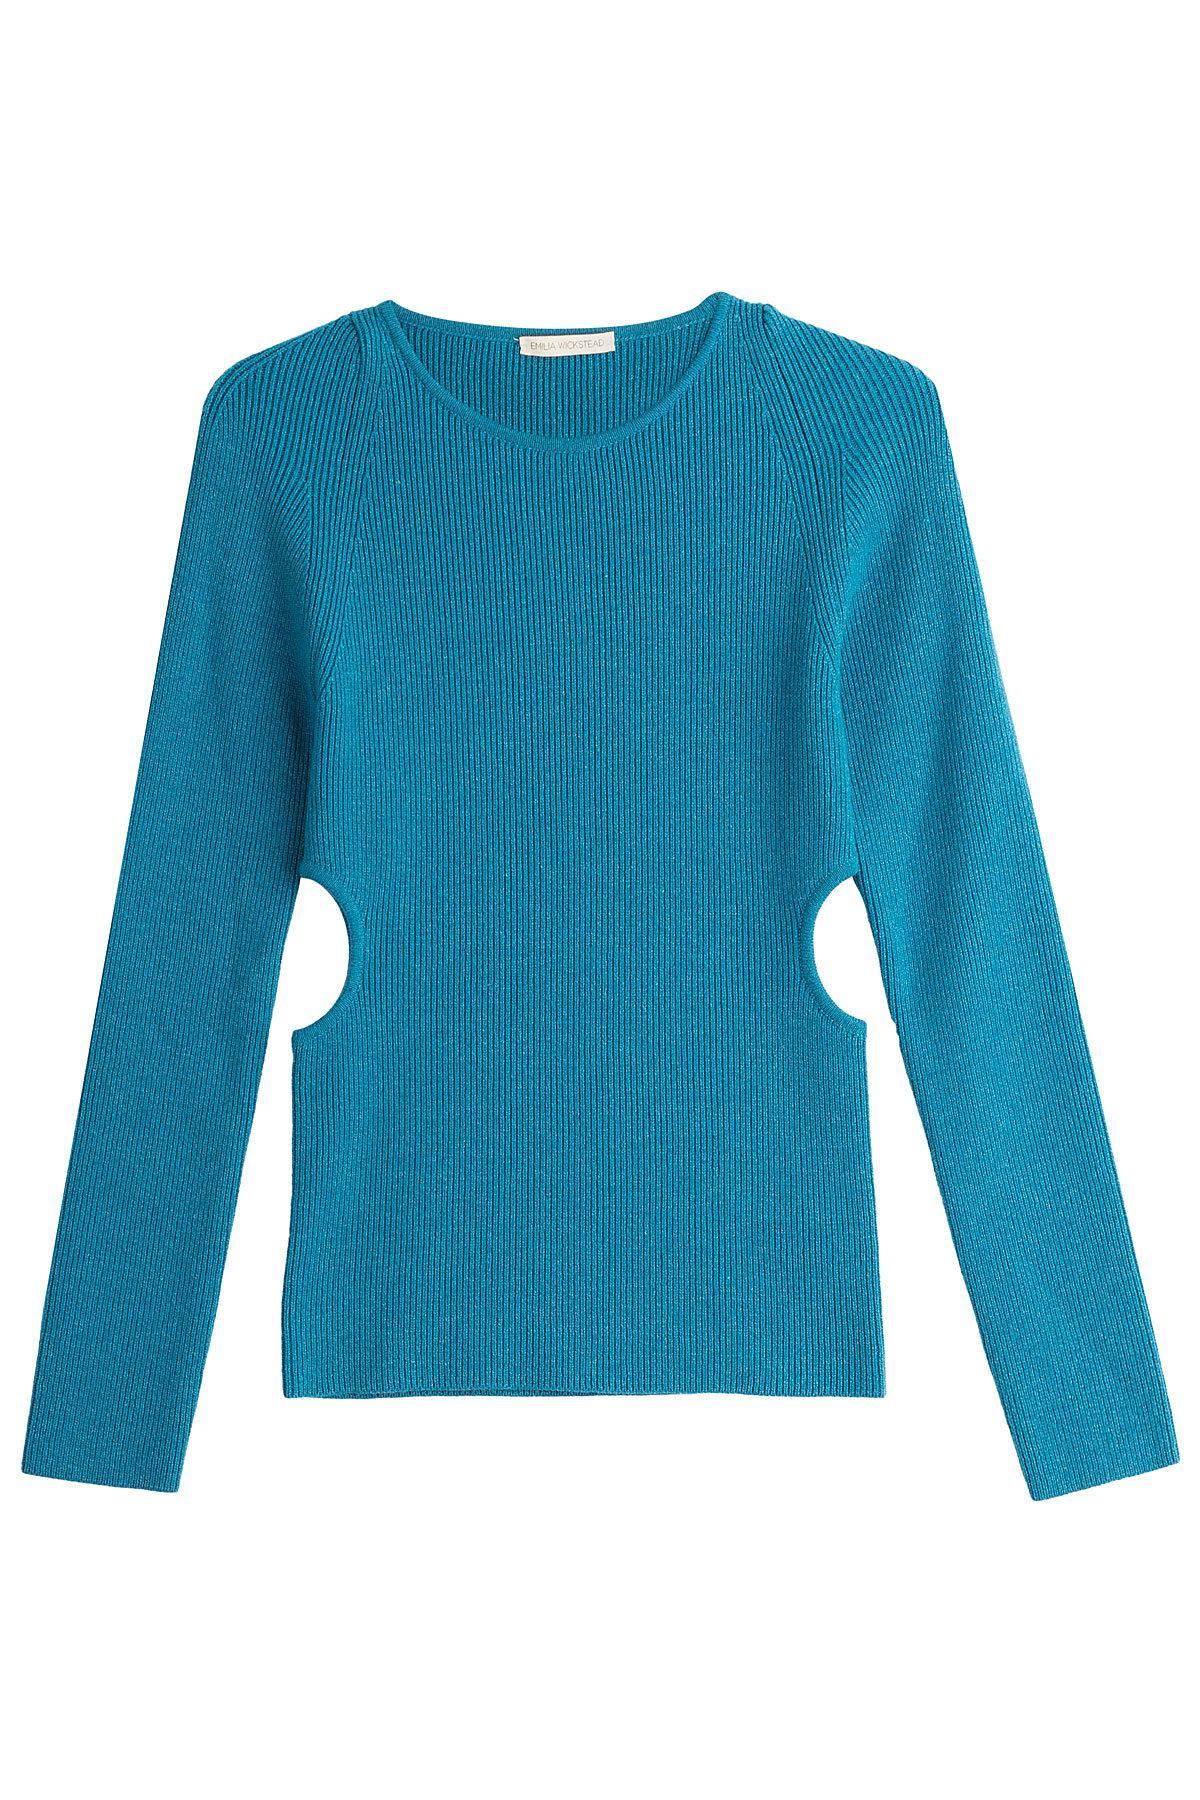 Sale Low Price Low Cost Online side cut out jumper - Blue Emilia Wickstead dJN0QoSF